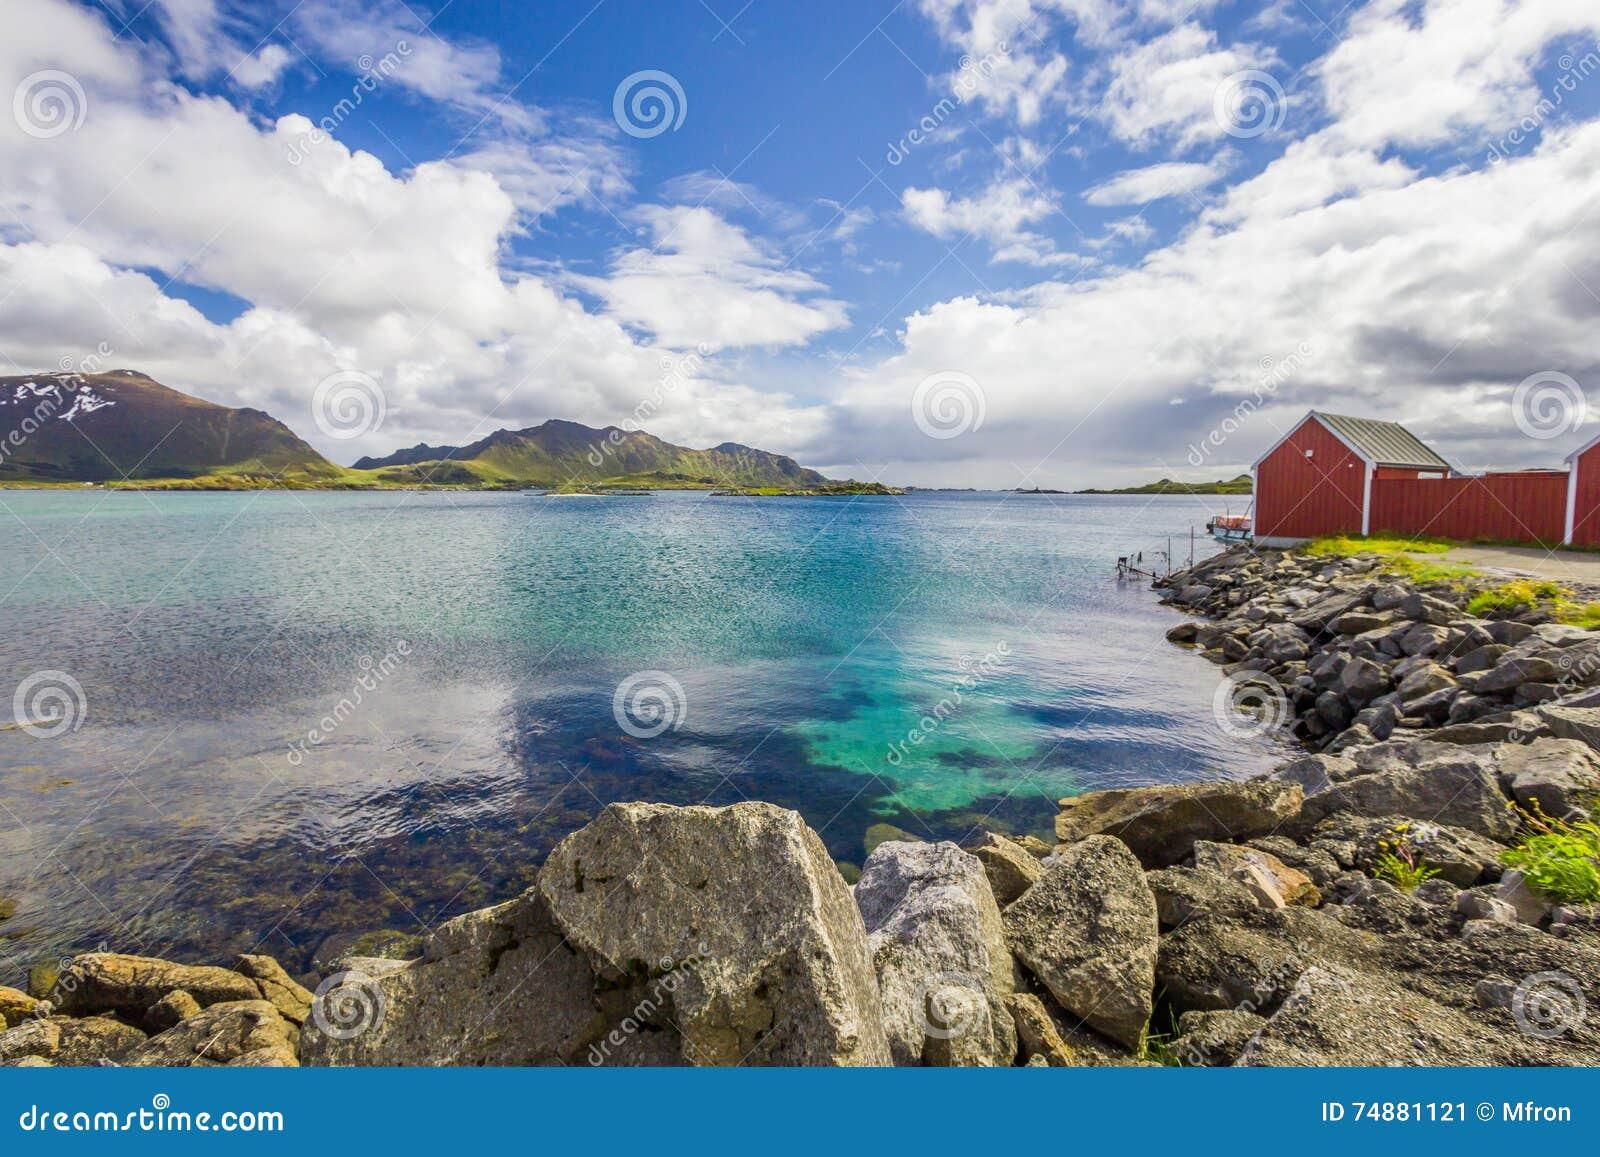 Vista de ilhas de Lofoten em Noruega